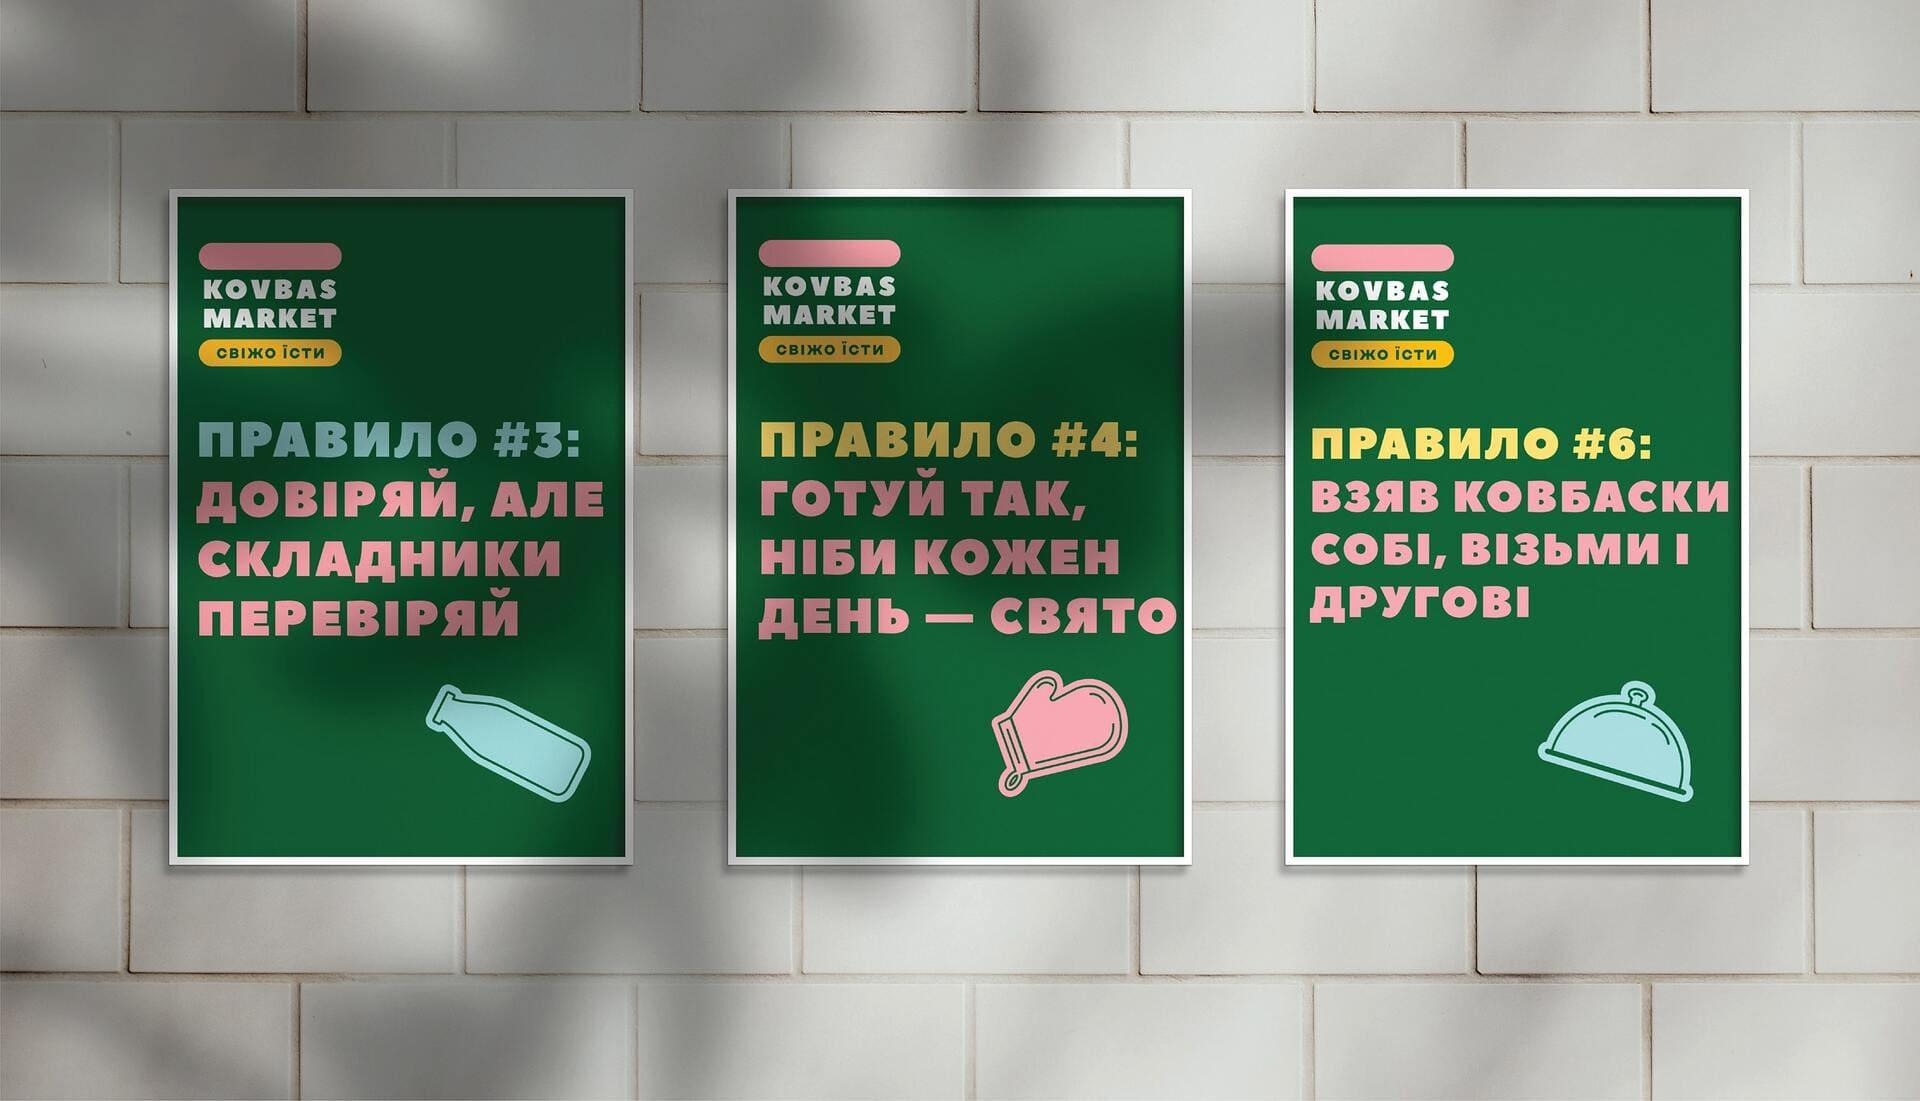 gra brand design kovbas market 5